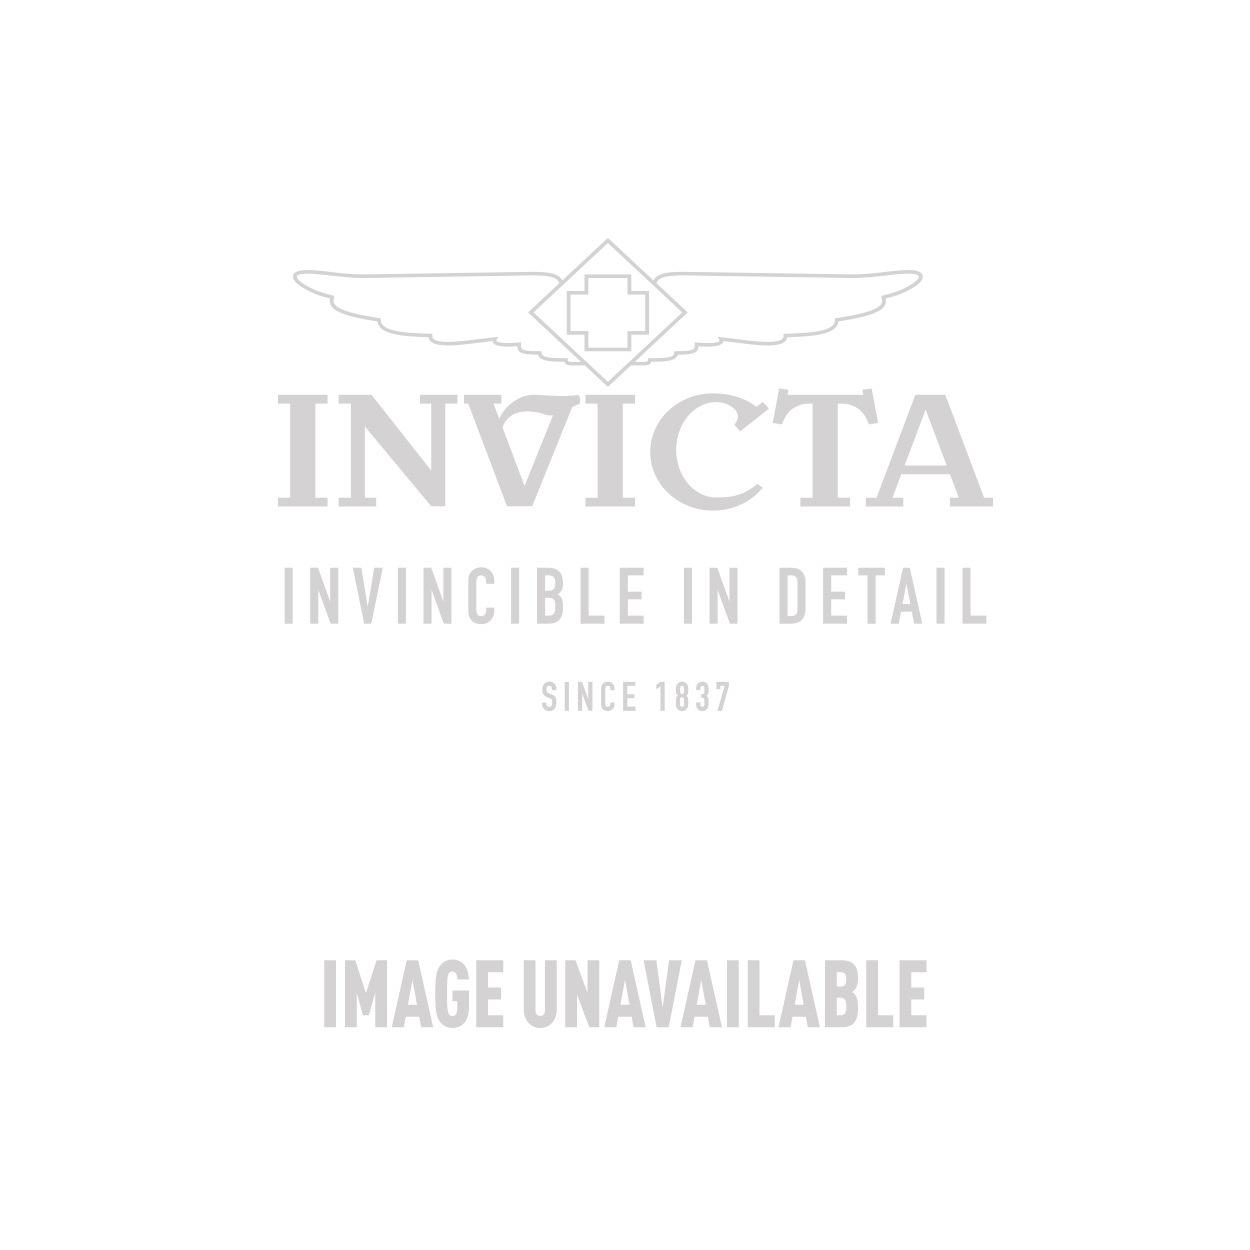 INVICTA Jewelry ALOYSIUS Earrings None 10.4 Silver 925 and Ceramic Rhodium+White+Platinum - Model J0114